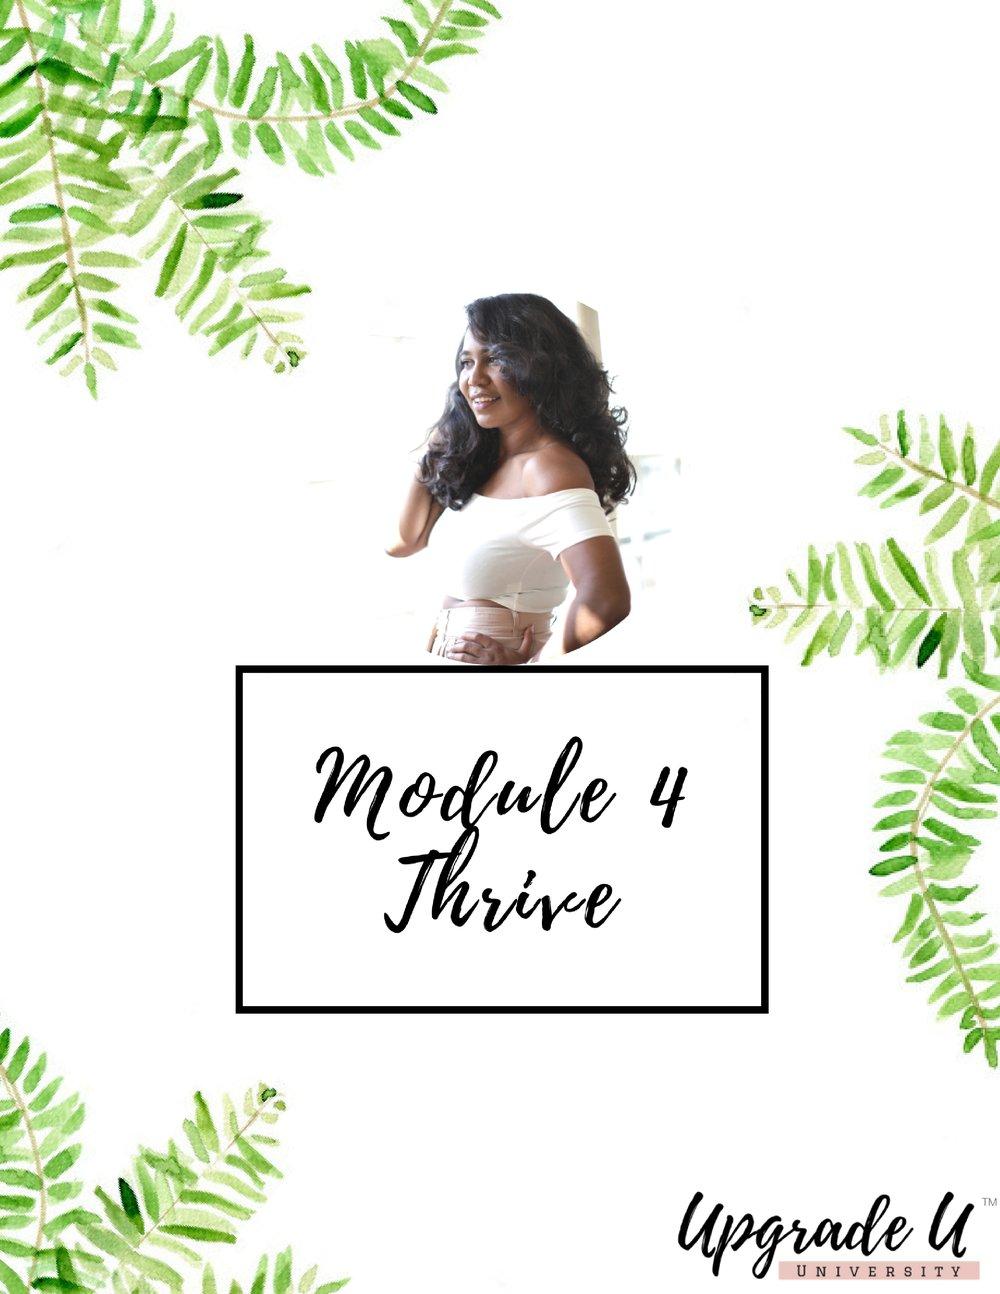 Module 4 Thrive.jpg